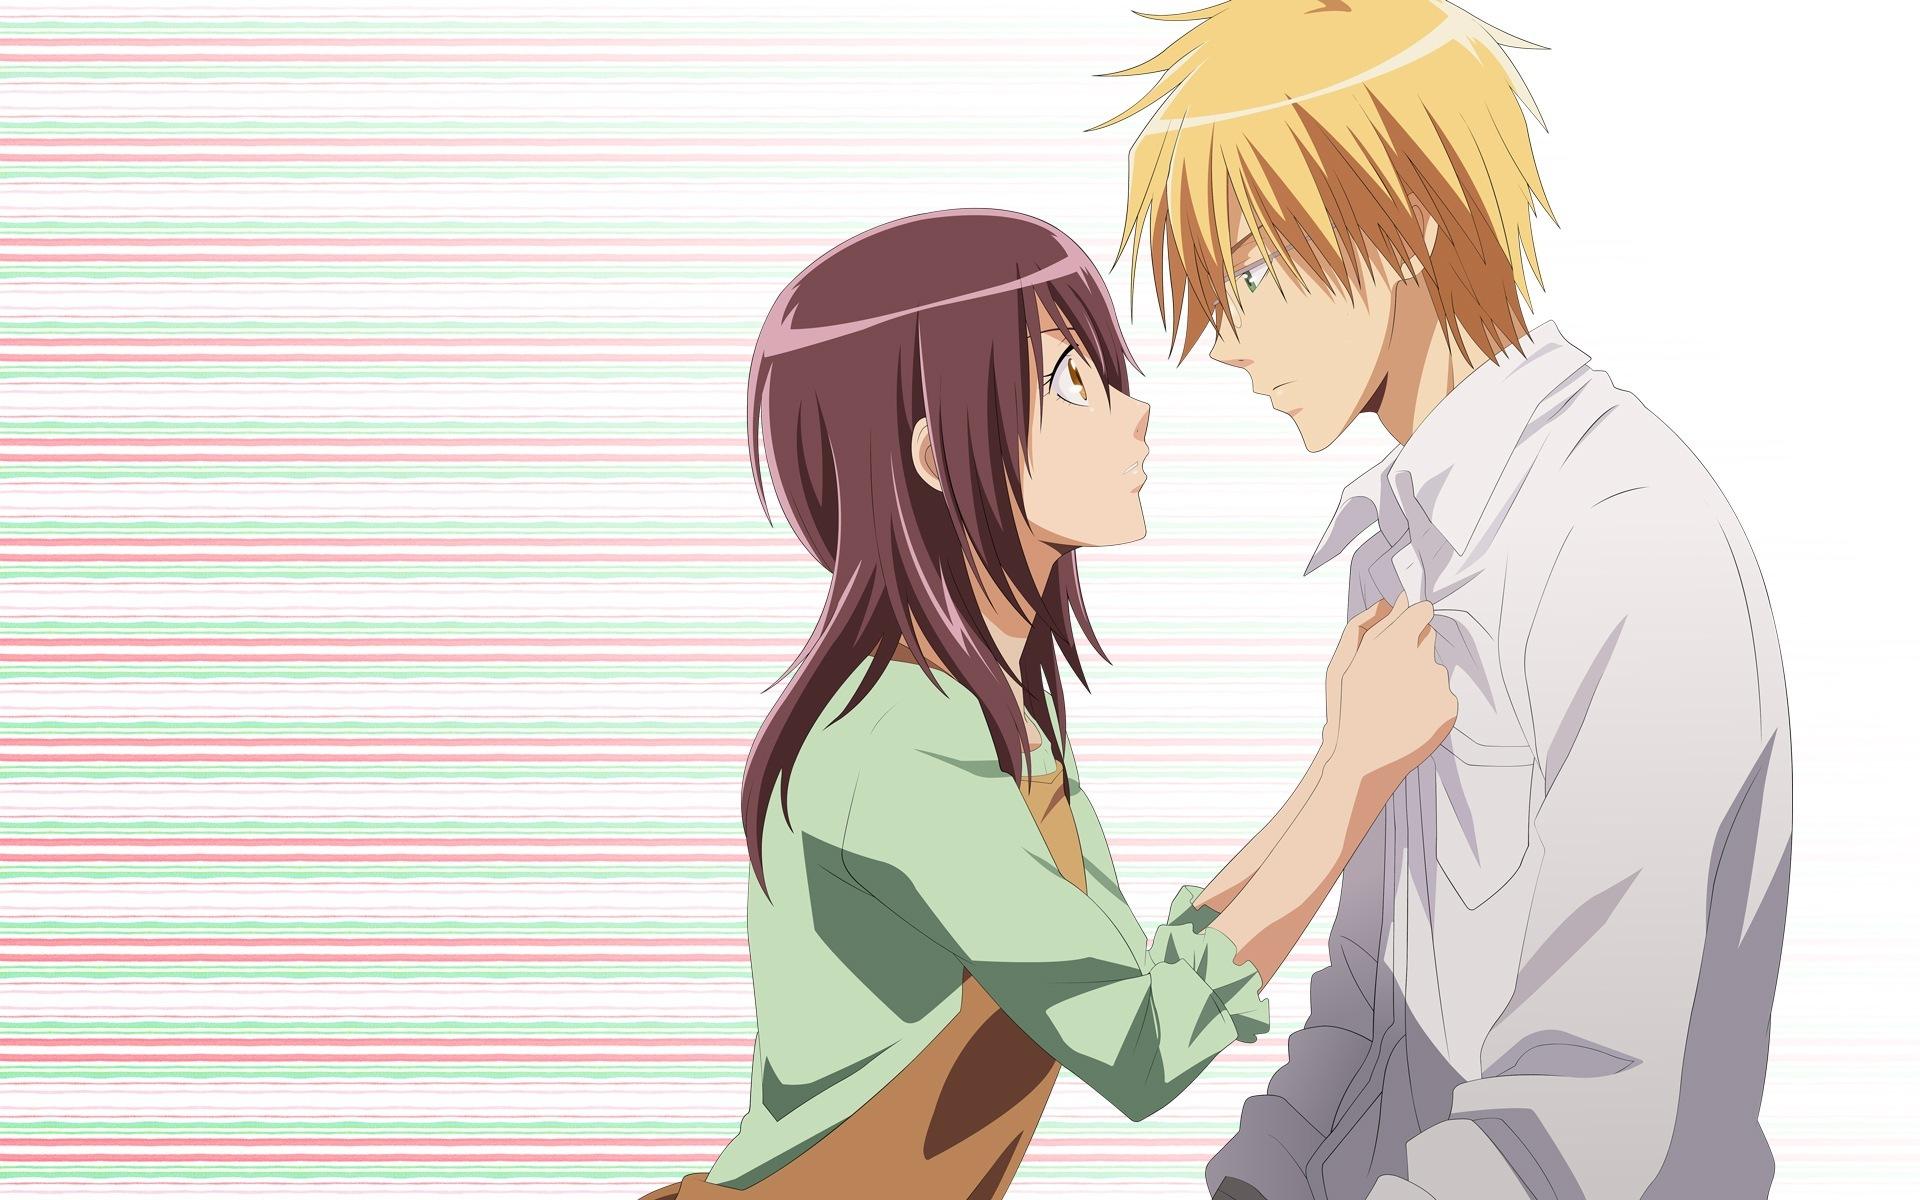 Superb Wallpapers With Quotes For Facebook Kawaii Anime Images ღ♡kawaii♡ღ Kaichou Wa Maid Sama Hd